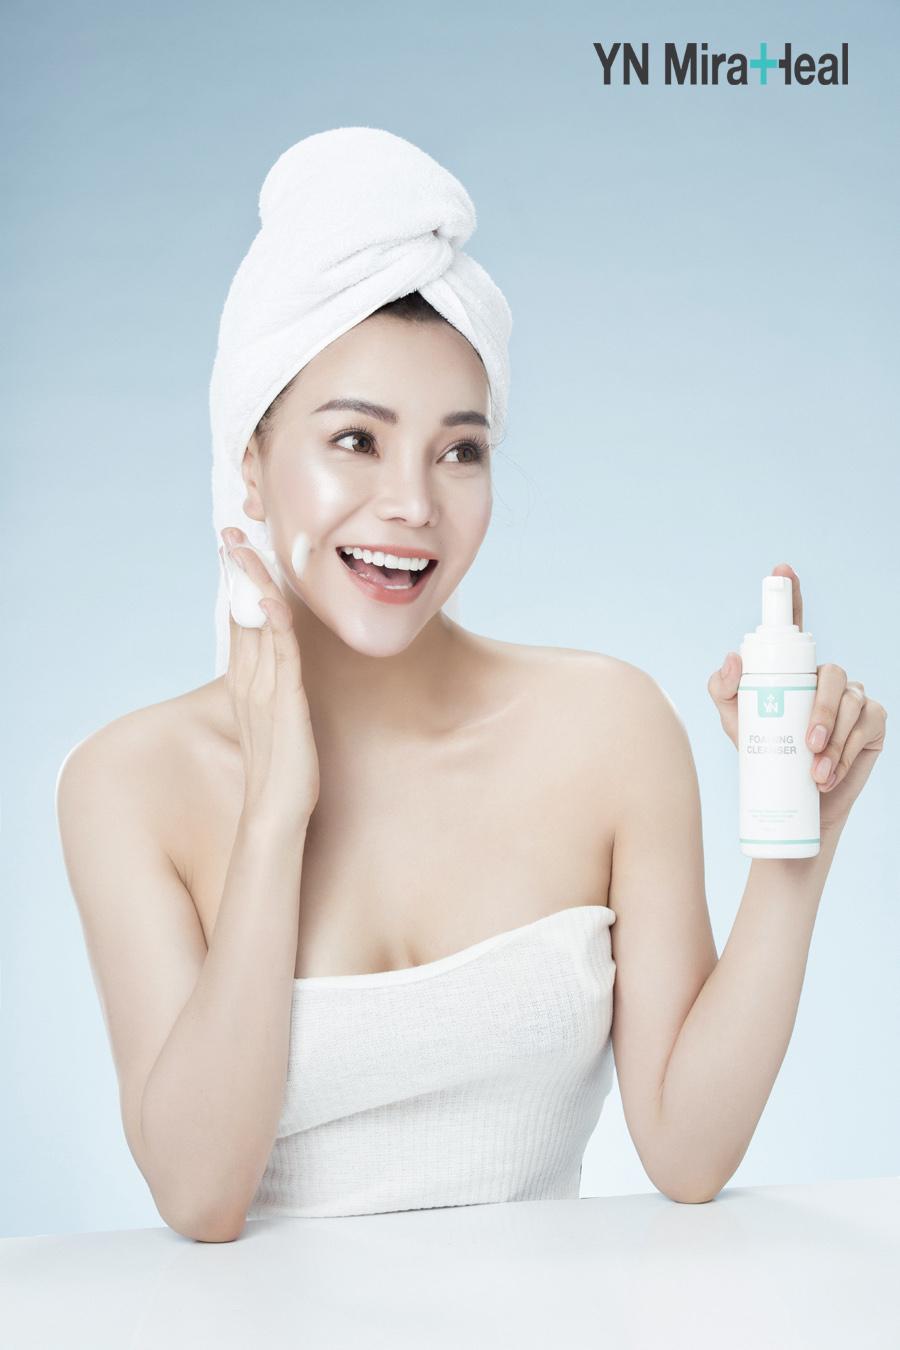 Làm sạch da bằng sữa rửa mặt tạo bọt YN Miraheal Foaming Cleanser dịu nhẹ với làn da nhạy cảm